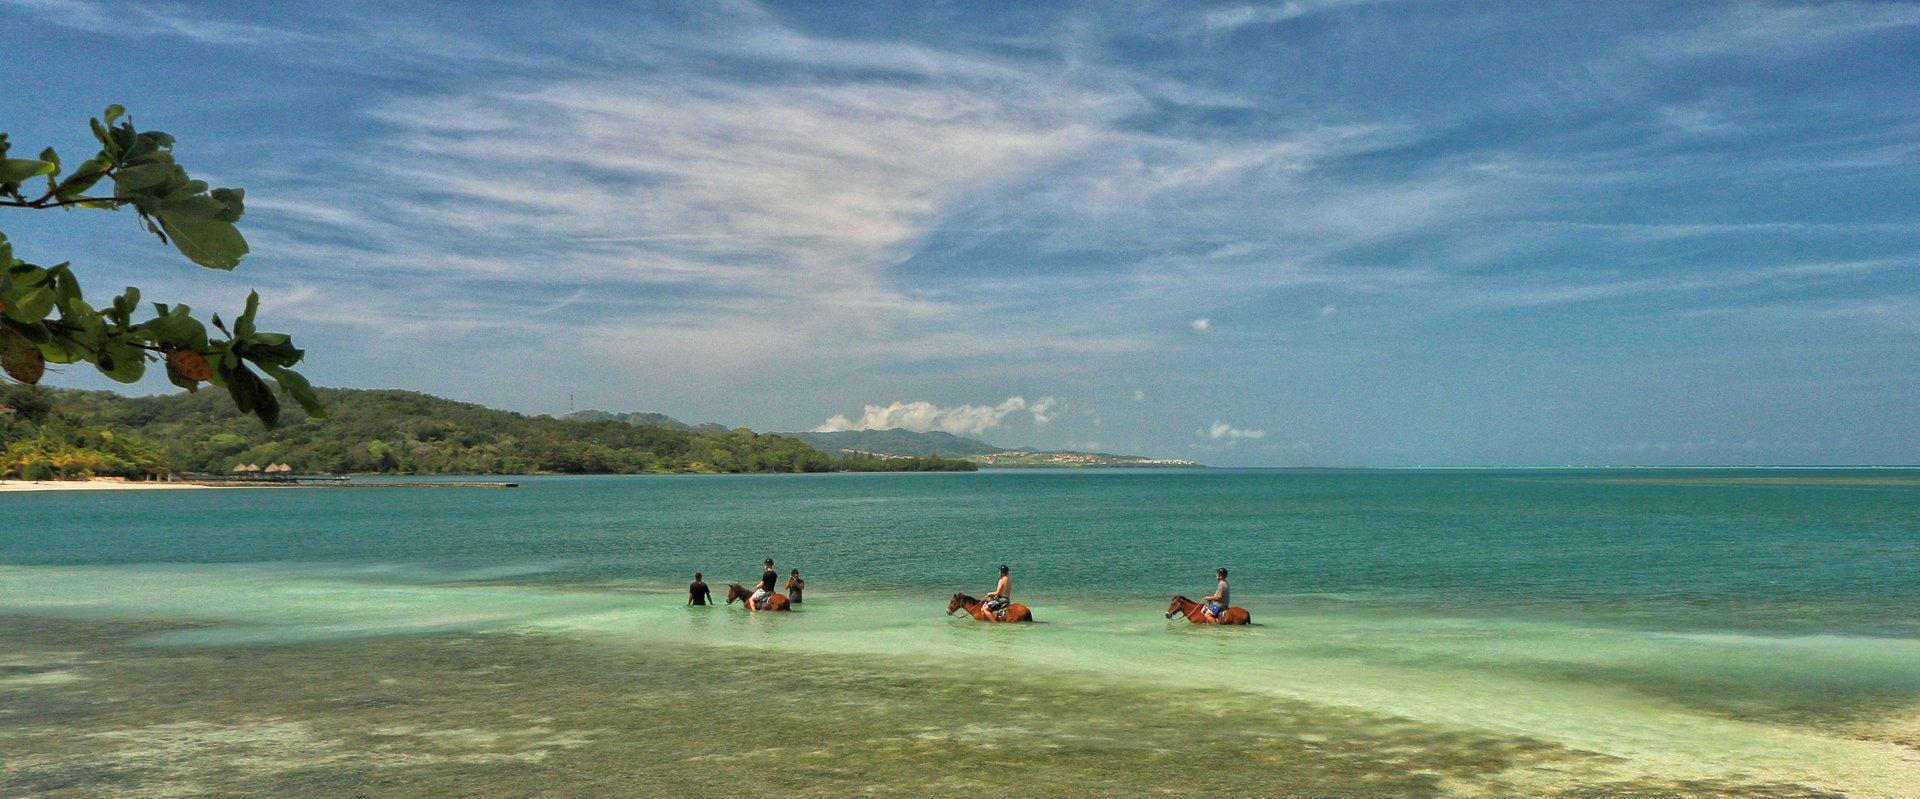 Horseback Riding on Roatán in Honduras - Best Season 2019